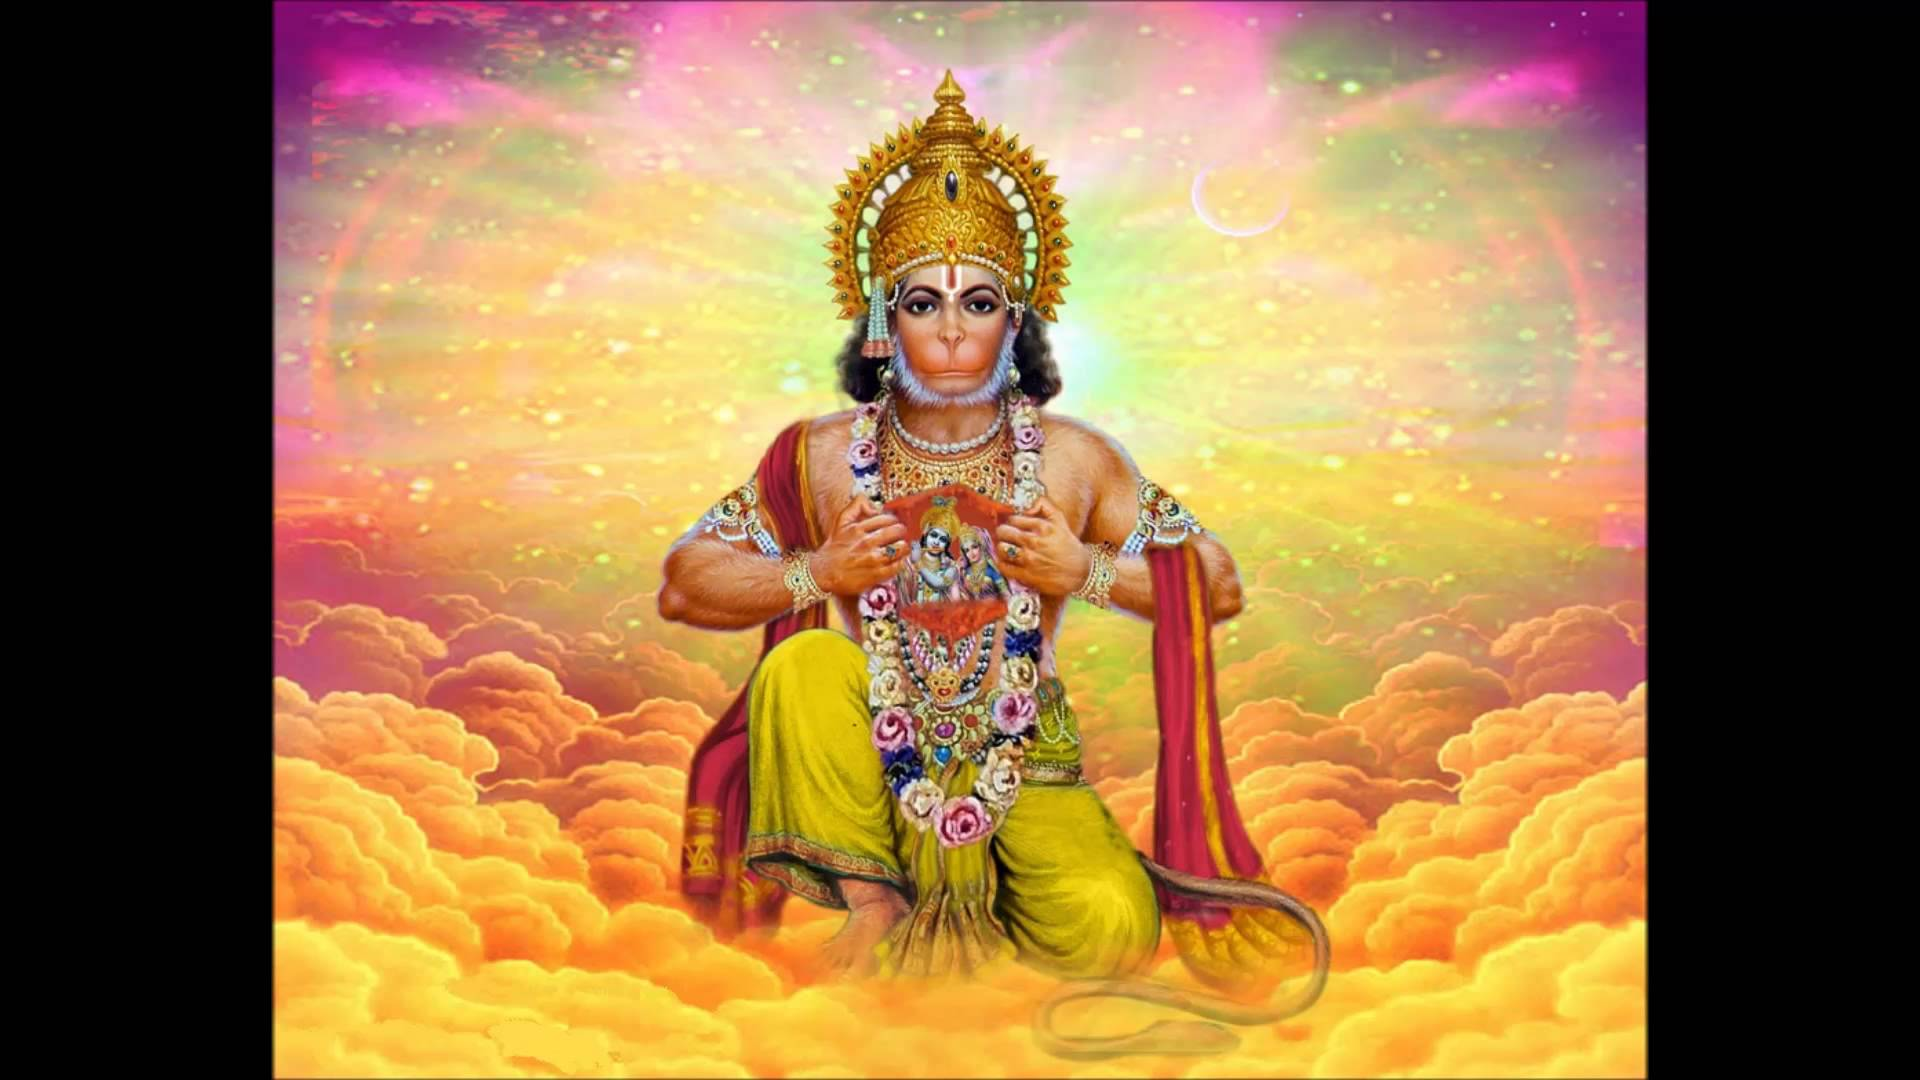 Sri Sundarakhanda Ramayana of Goswami Tulsidas